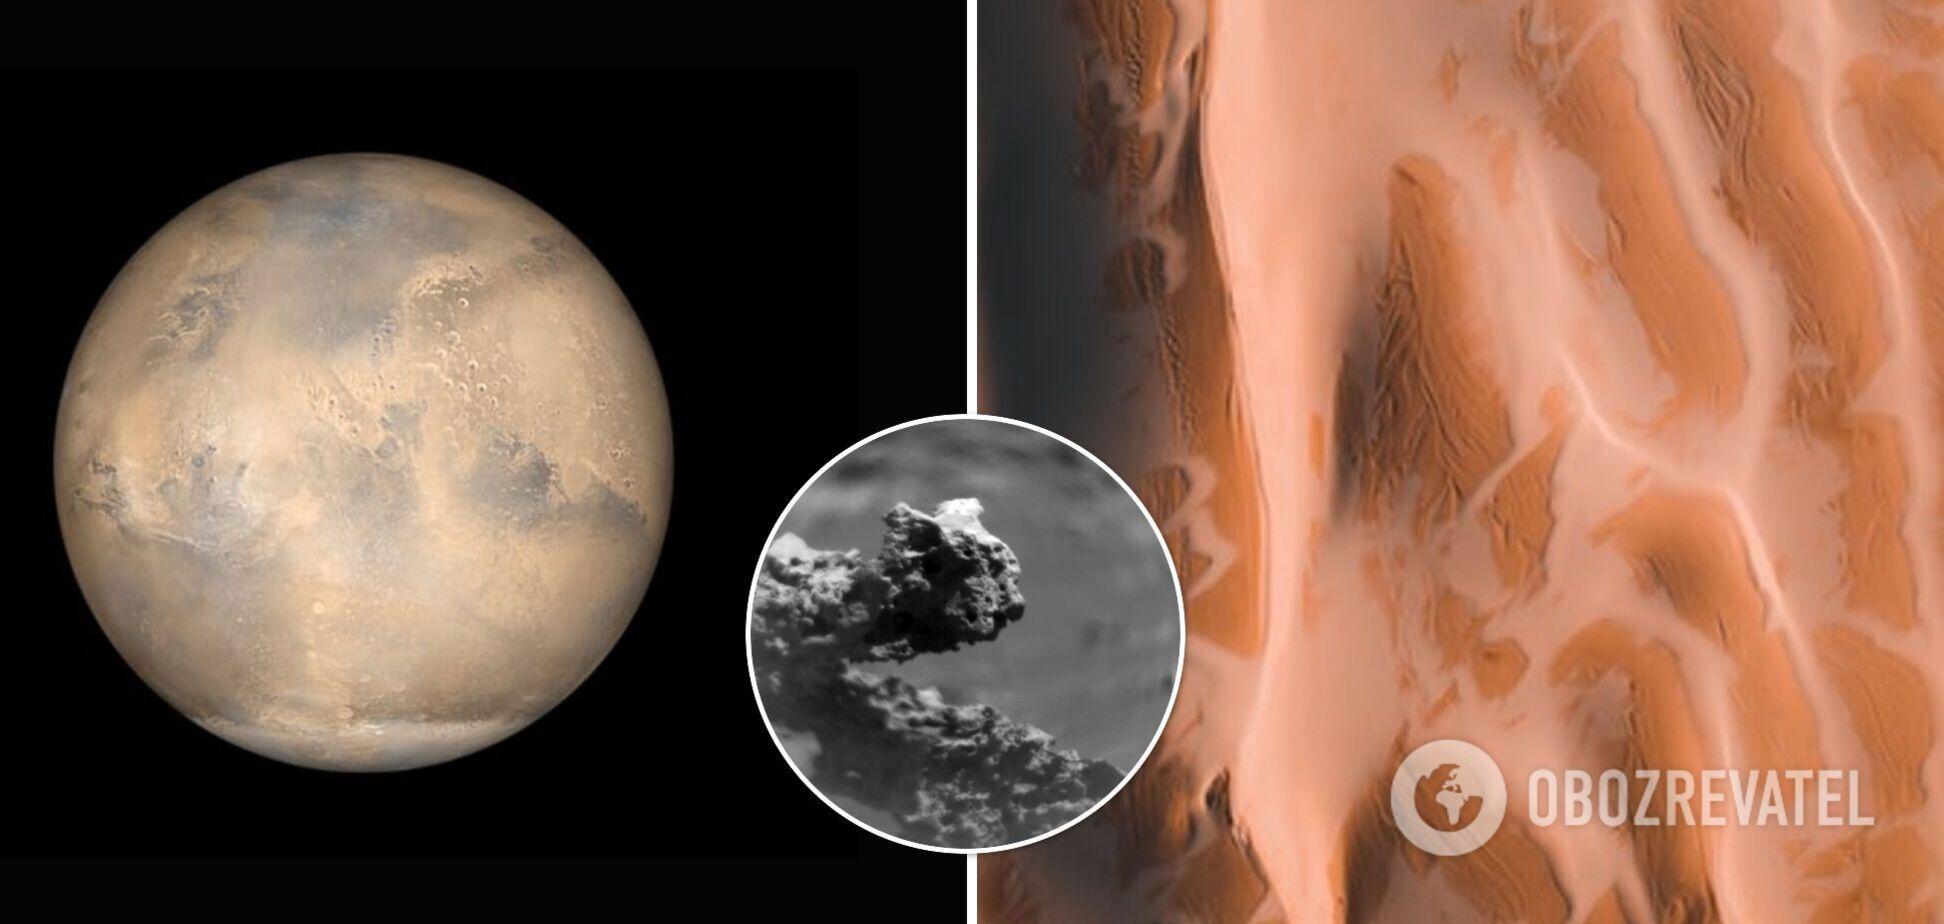 Марсоход Curiosity обнаружил на Марсе загадочную структуру, напоминающую по форме ящерицу. Фото